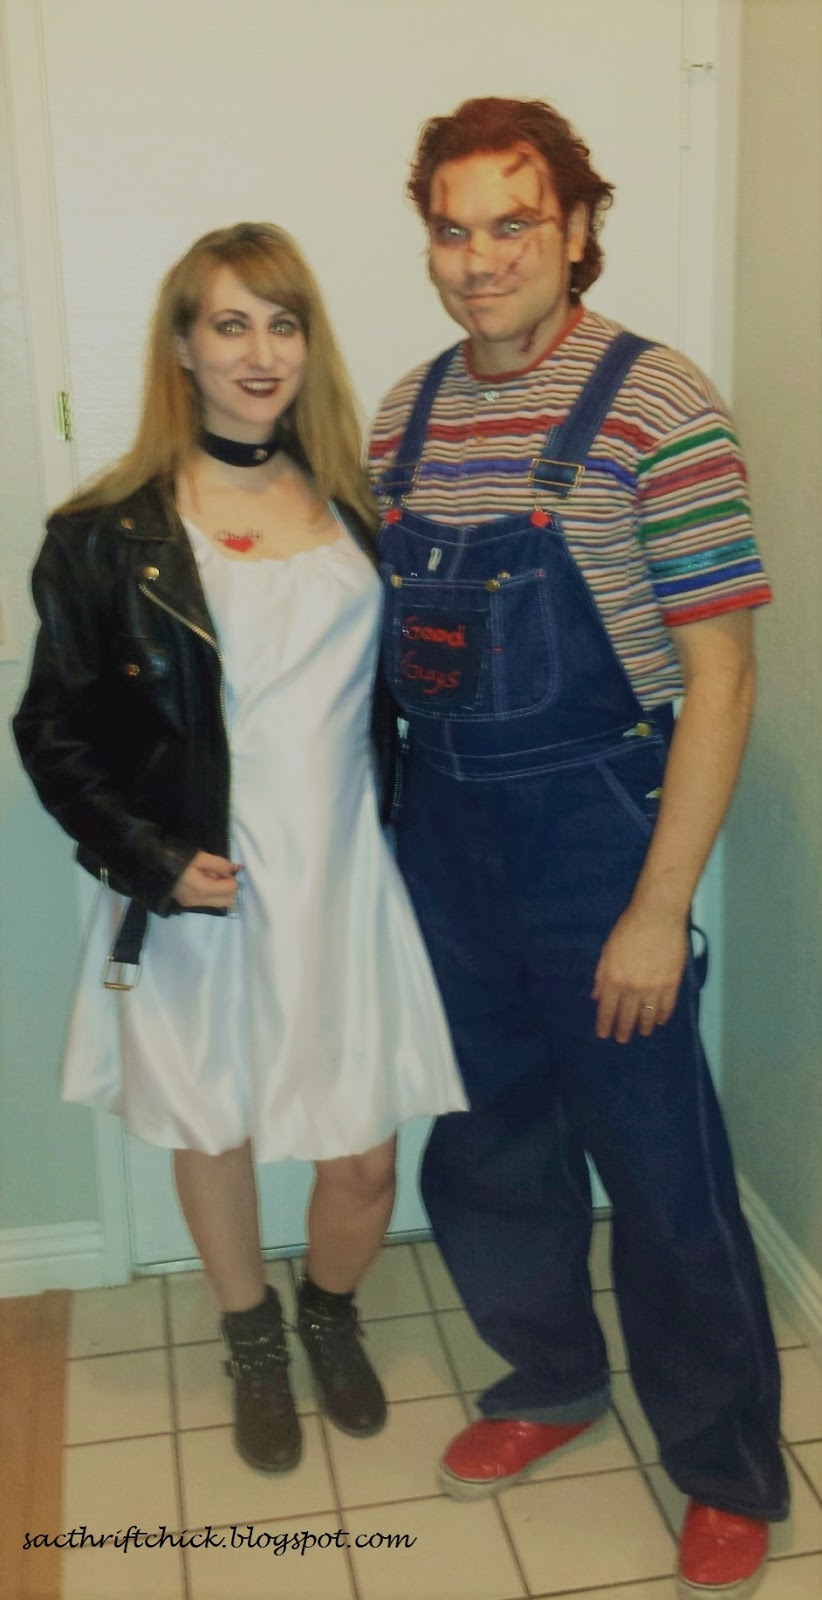 diy bride of chucky halloween costumes | ❈sac thrift chick❈